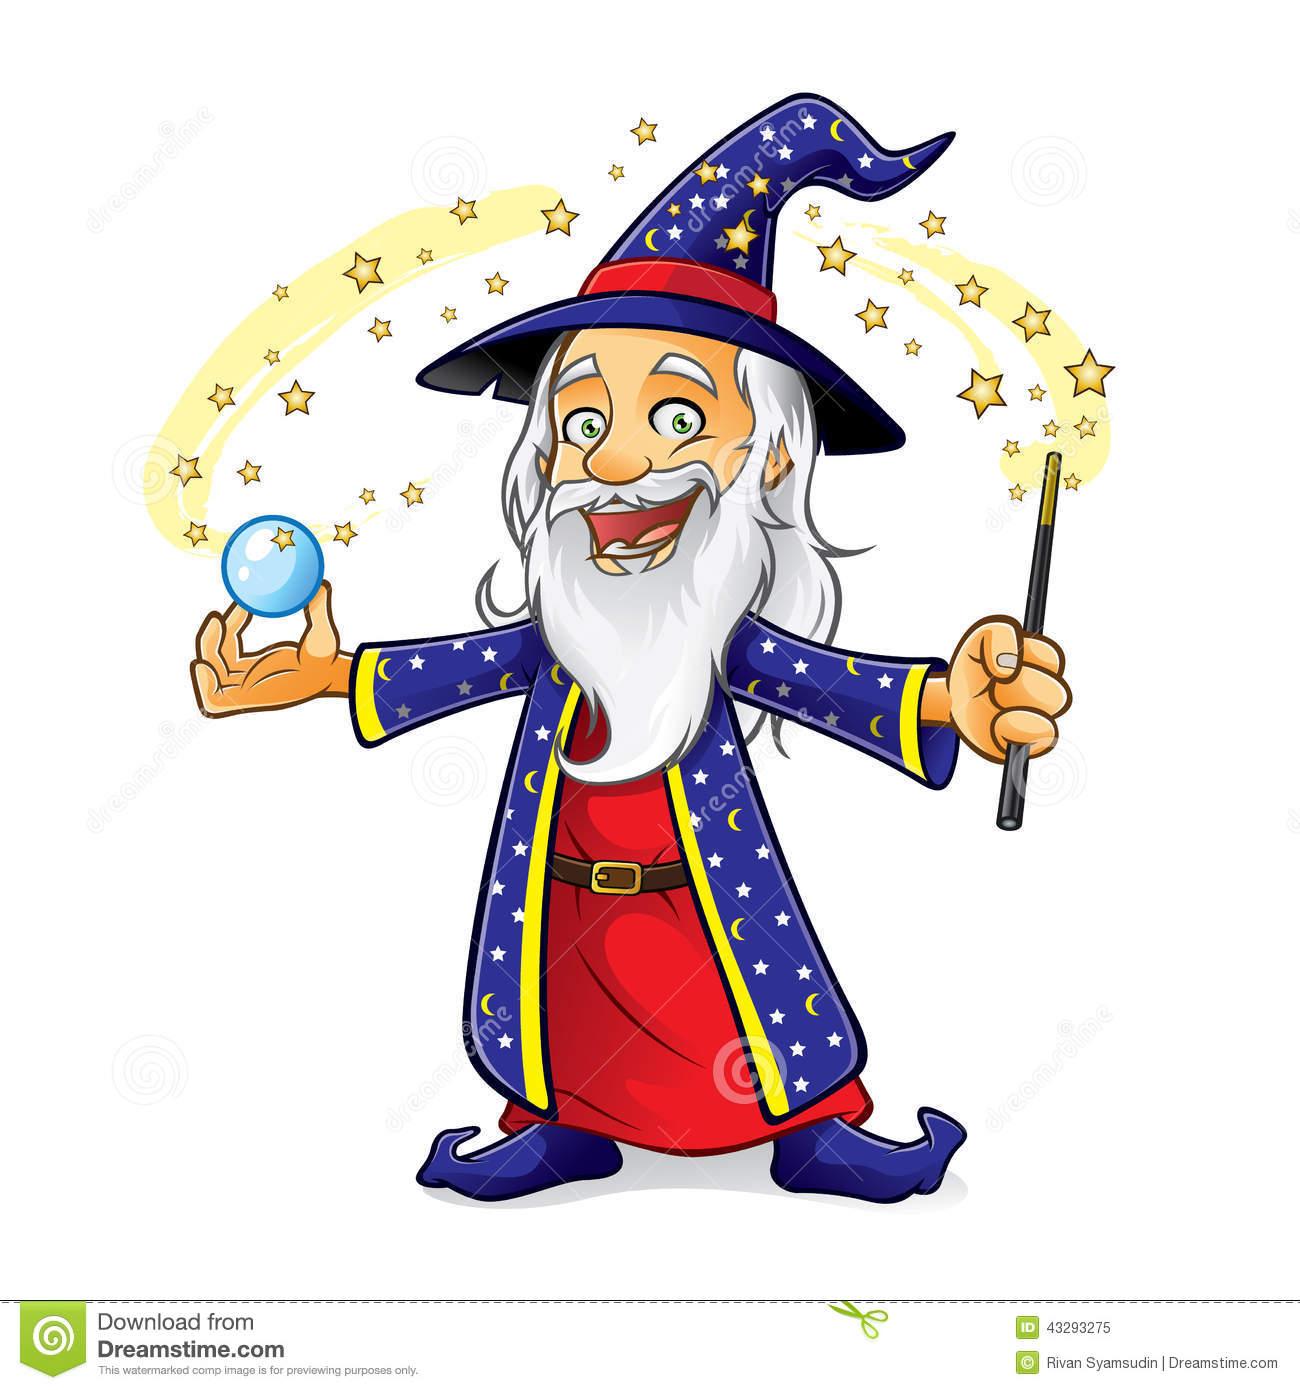 Zauberer, Illusionsshow - Conjurer Magician - St. Gallen CH